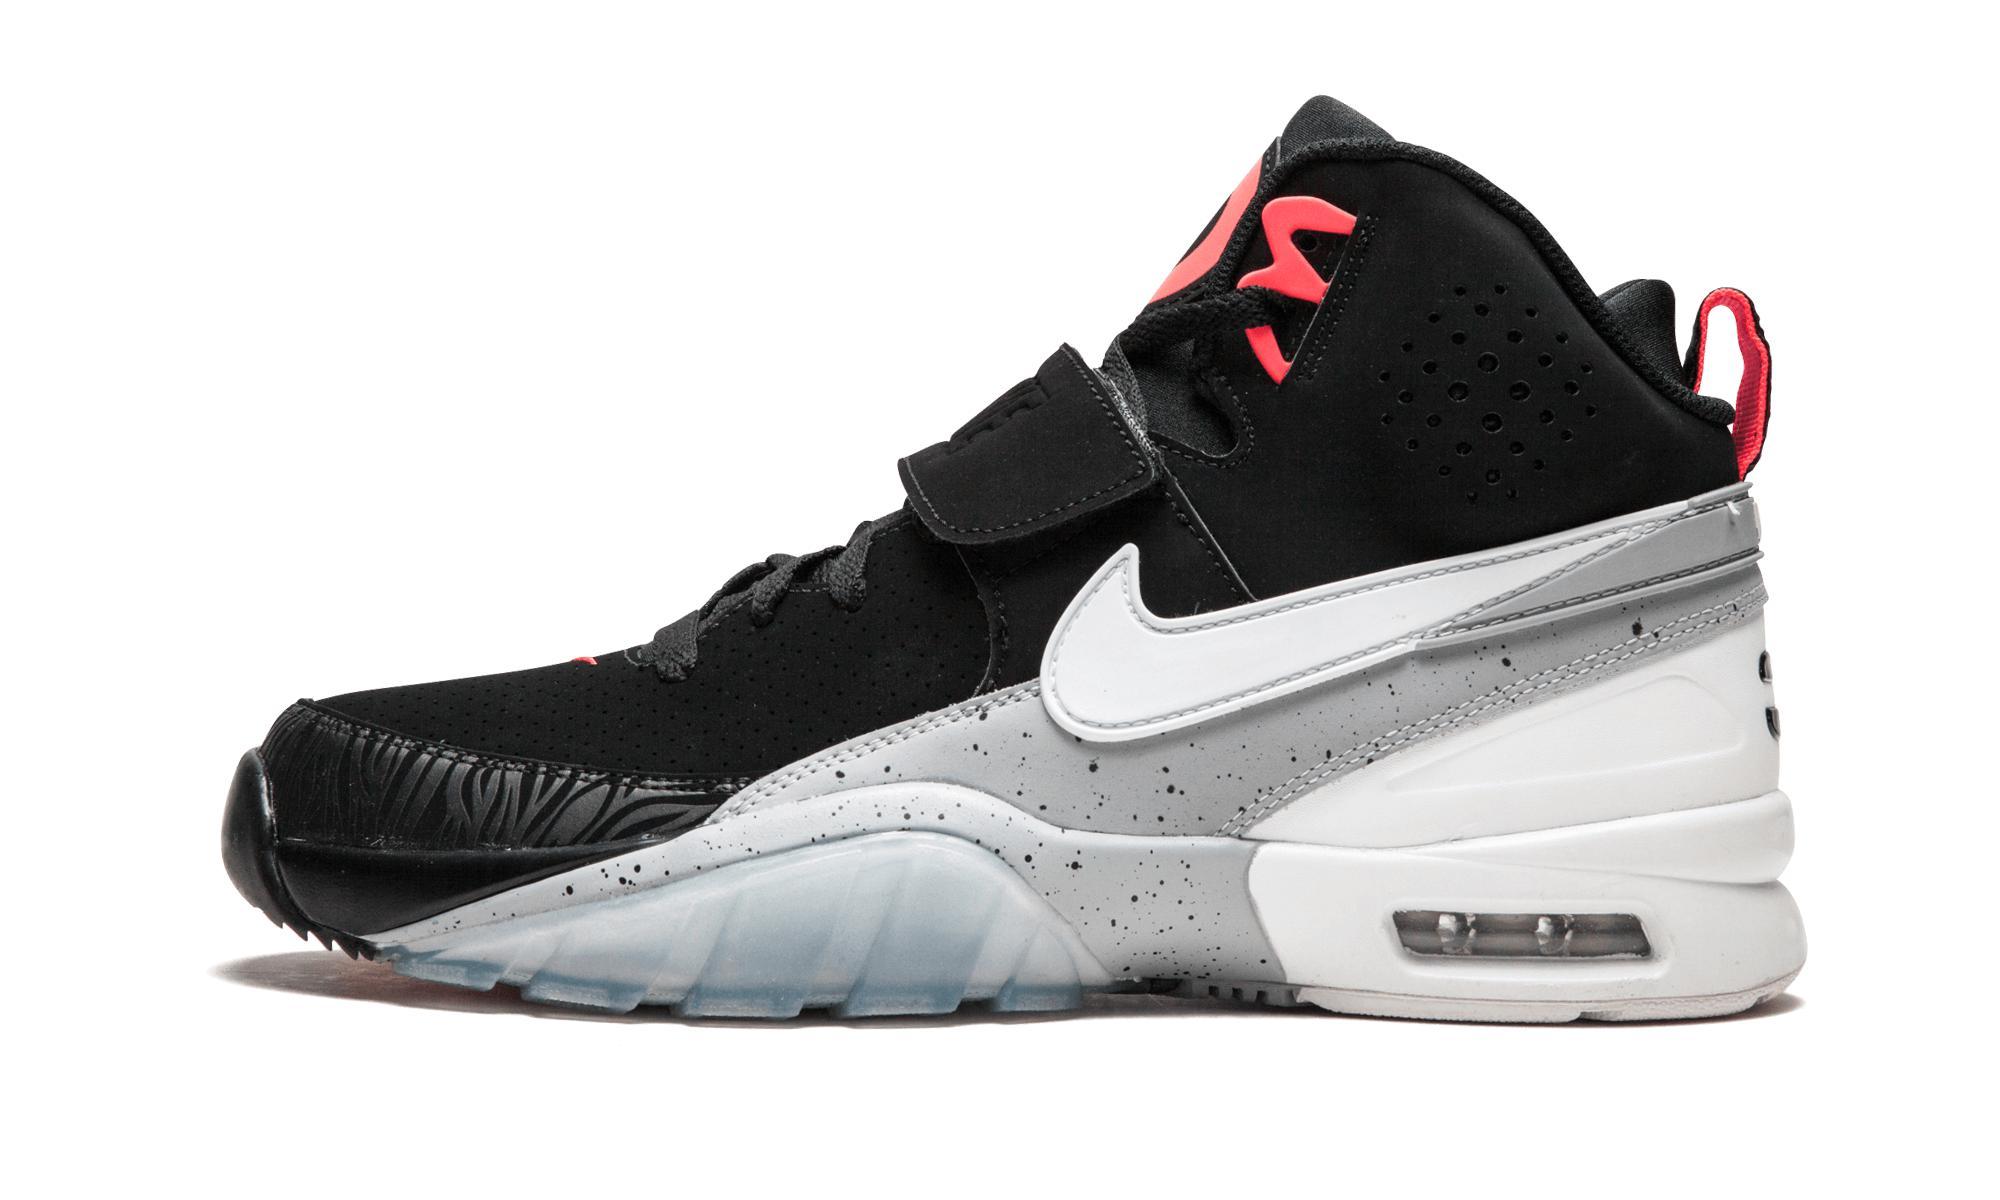 Lyst 1 Air Bo Men for in Black Nike 4rOqw4